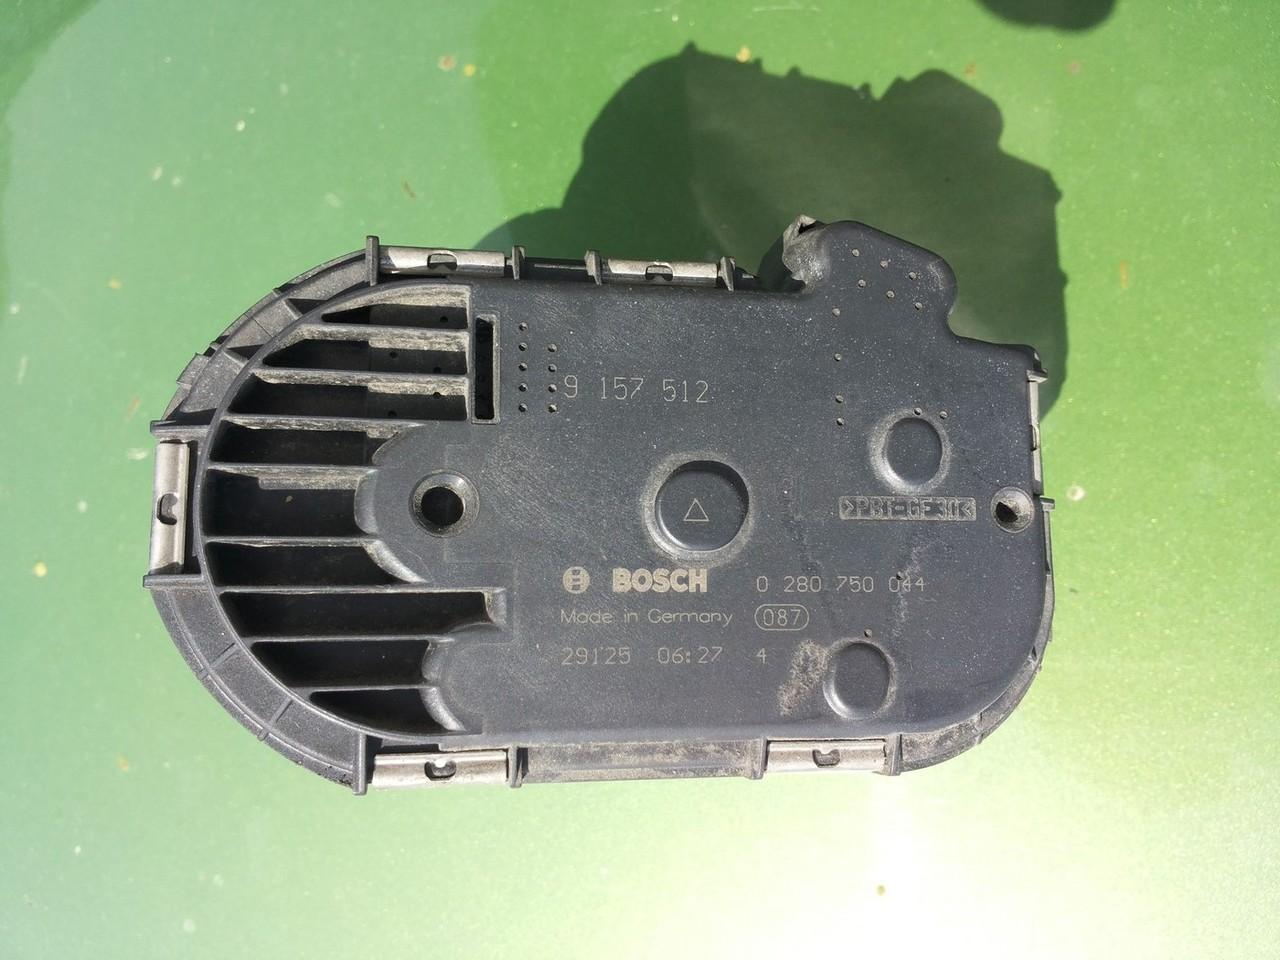 Opel Agila Clapeta acceleratie BOSCH 0280750044 pentru 1.2 16v tip motor z12xe